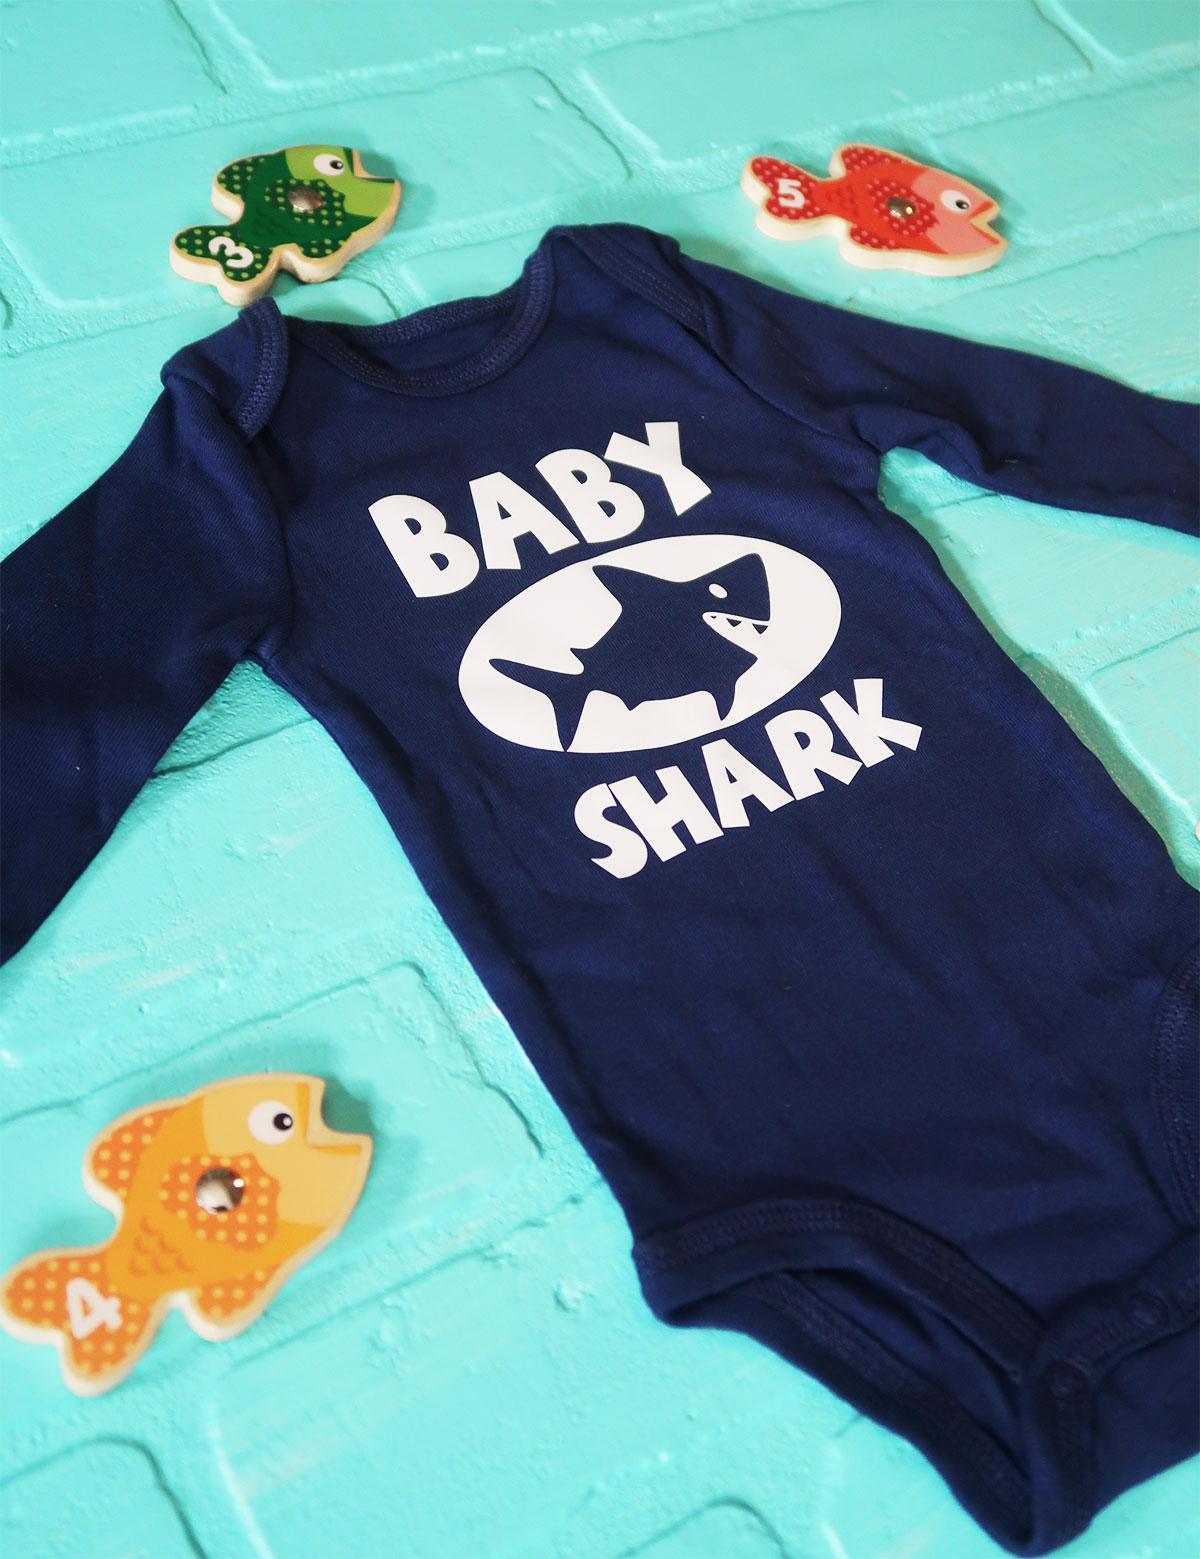 Baby_shark_onesie2.jpg